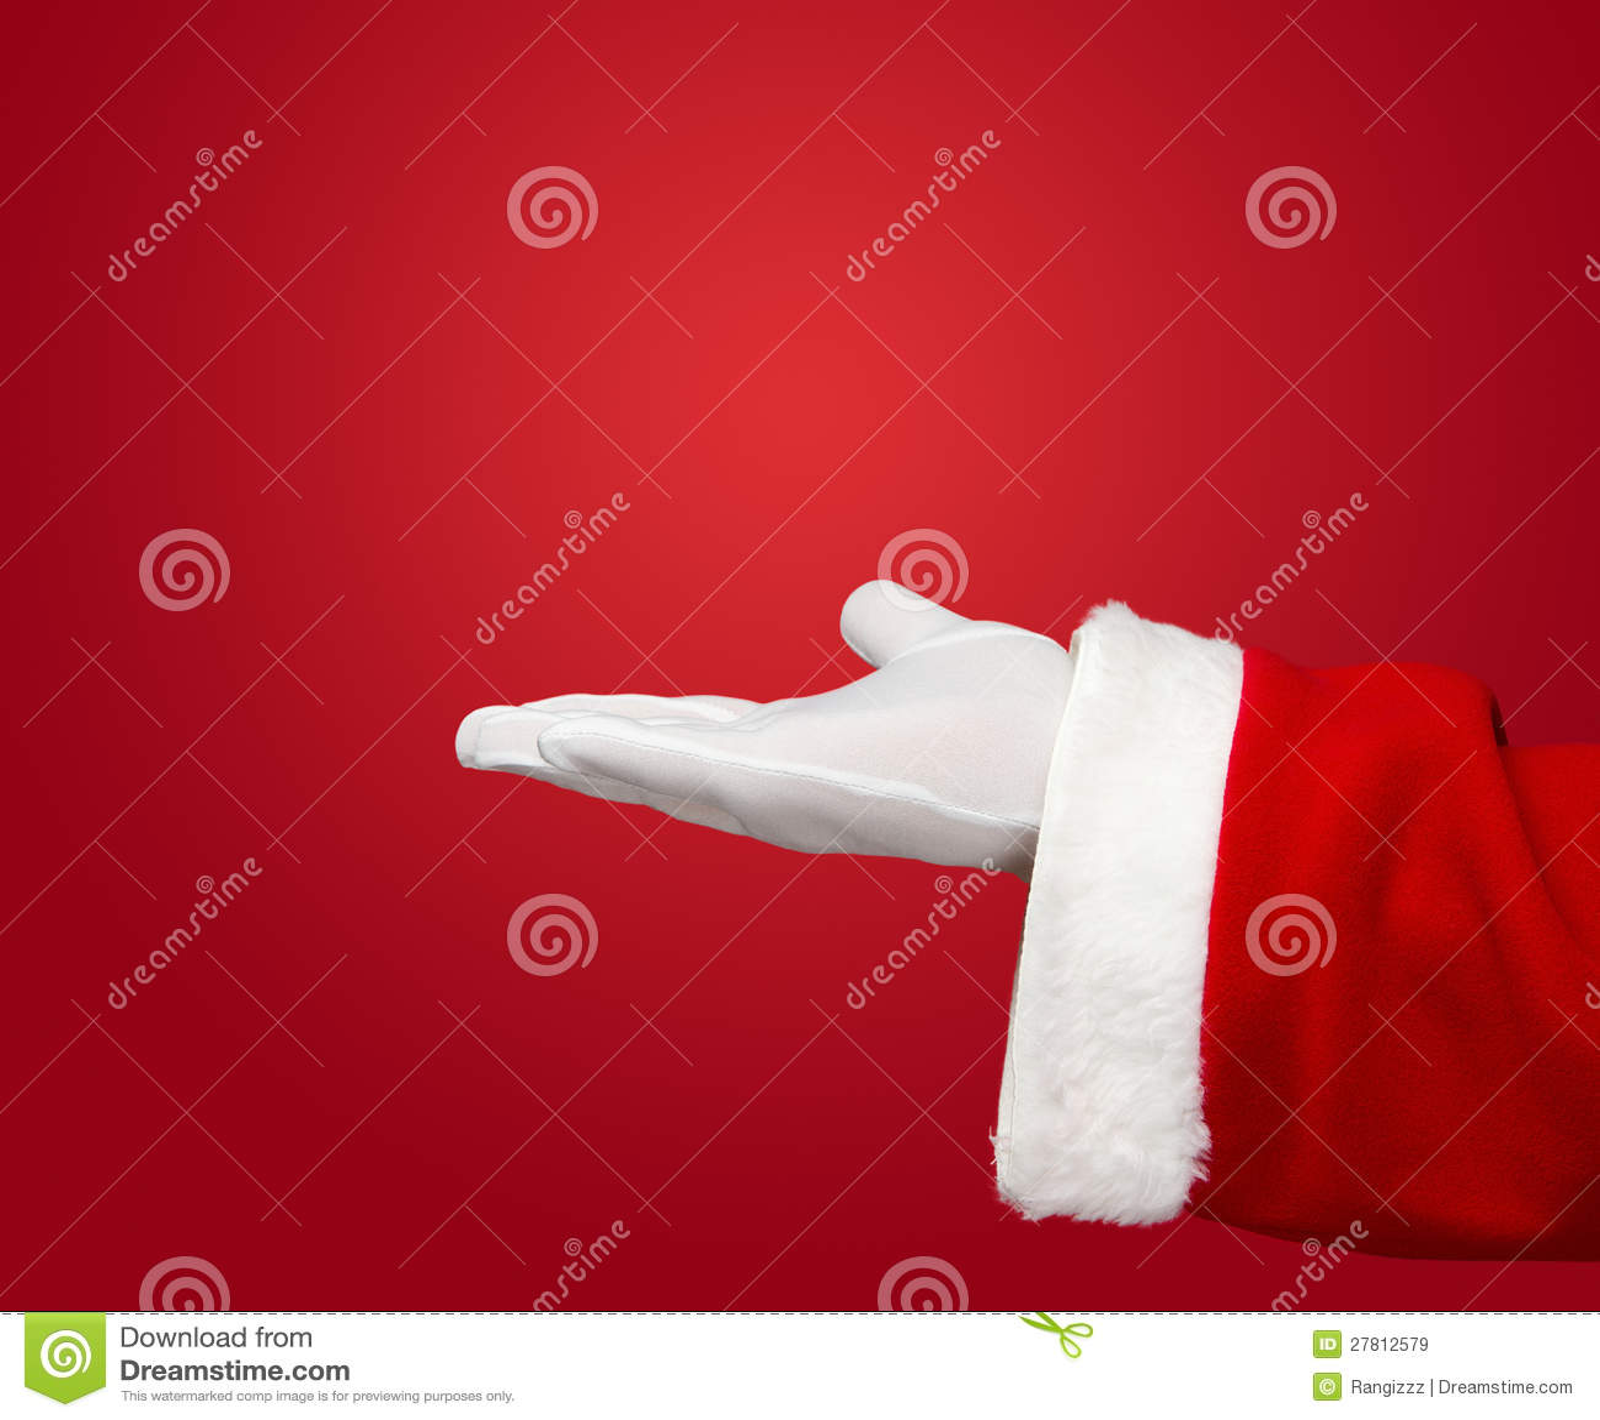 Santa Hand Stock Photos, Royalty-Free Images & Vectors - Shutterstock